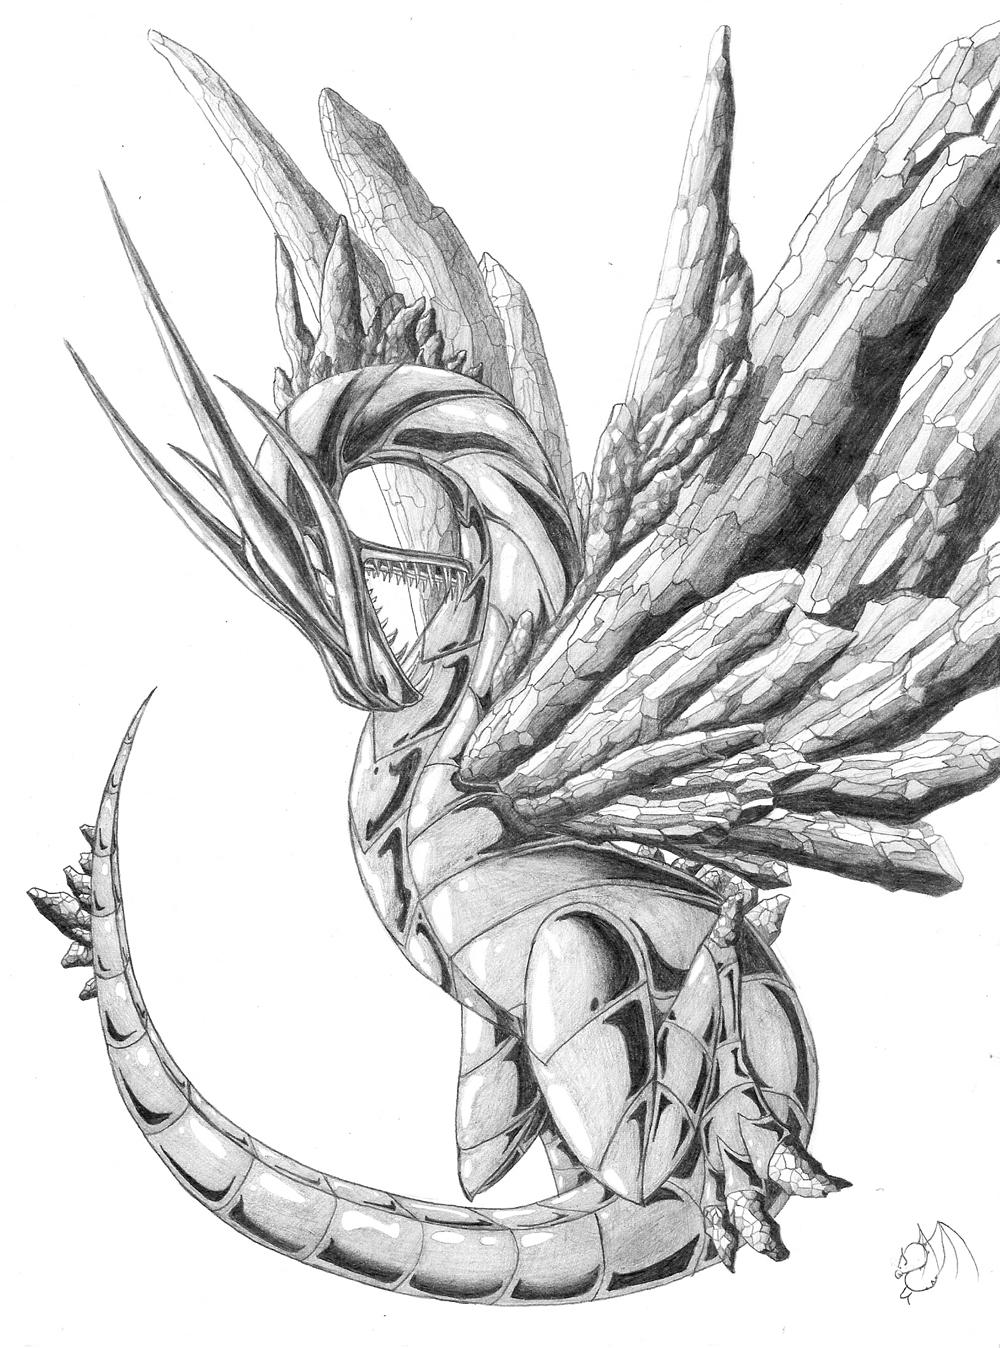 Metal Ice Dragon by Rioni-Riishu on DeviantArt